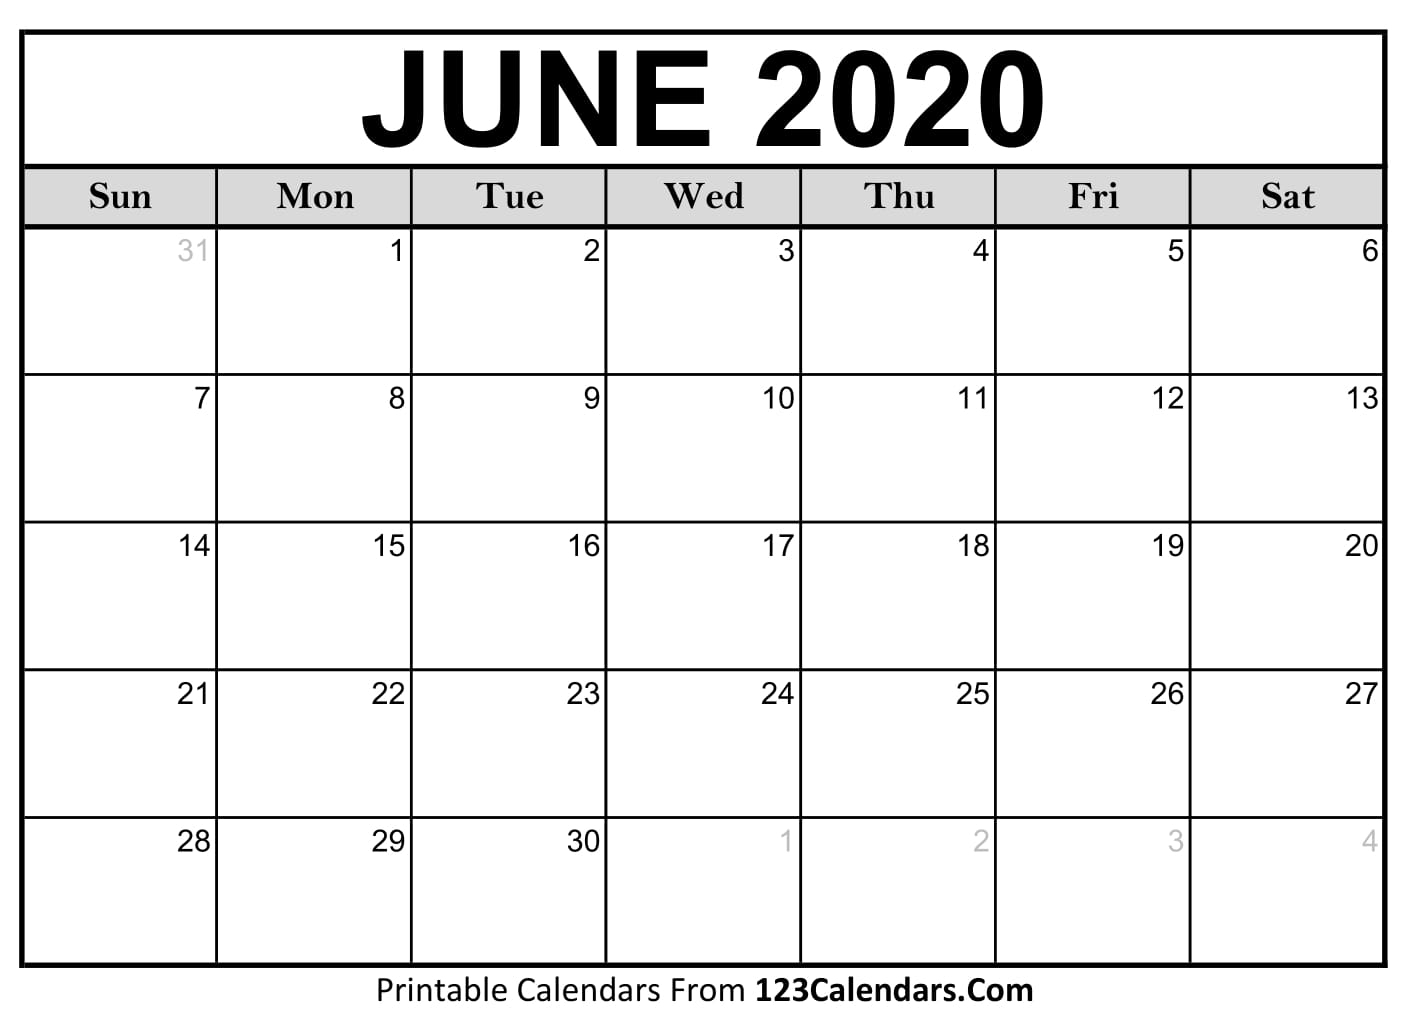 Printable June 2020 Calendar Templates | 123Calendars